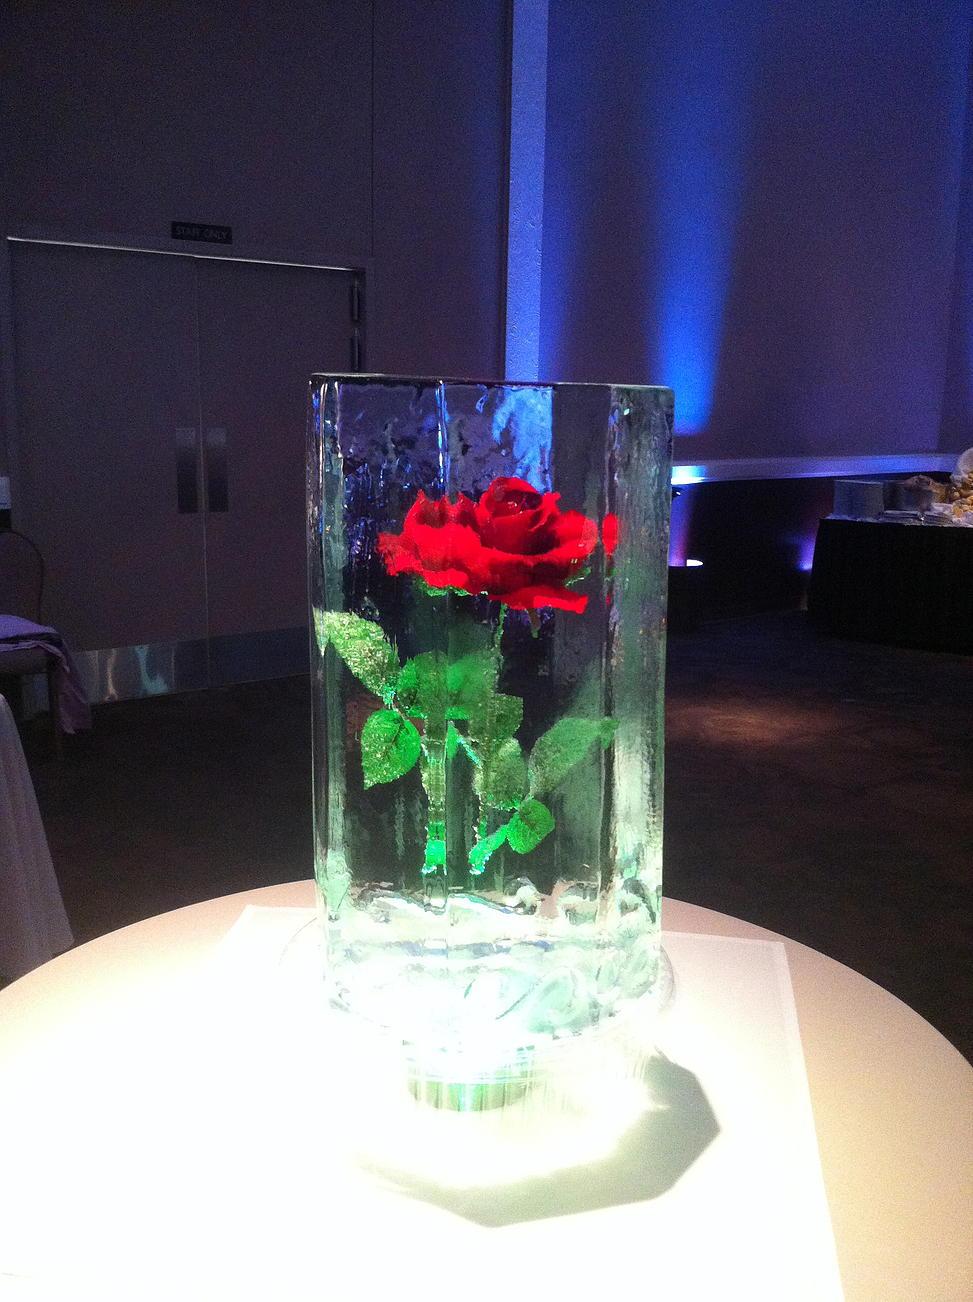 Frozen rose in ice